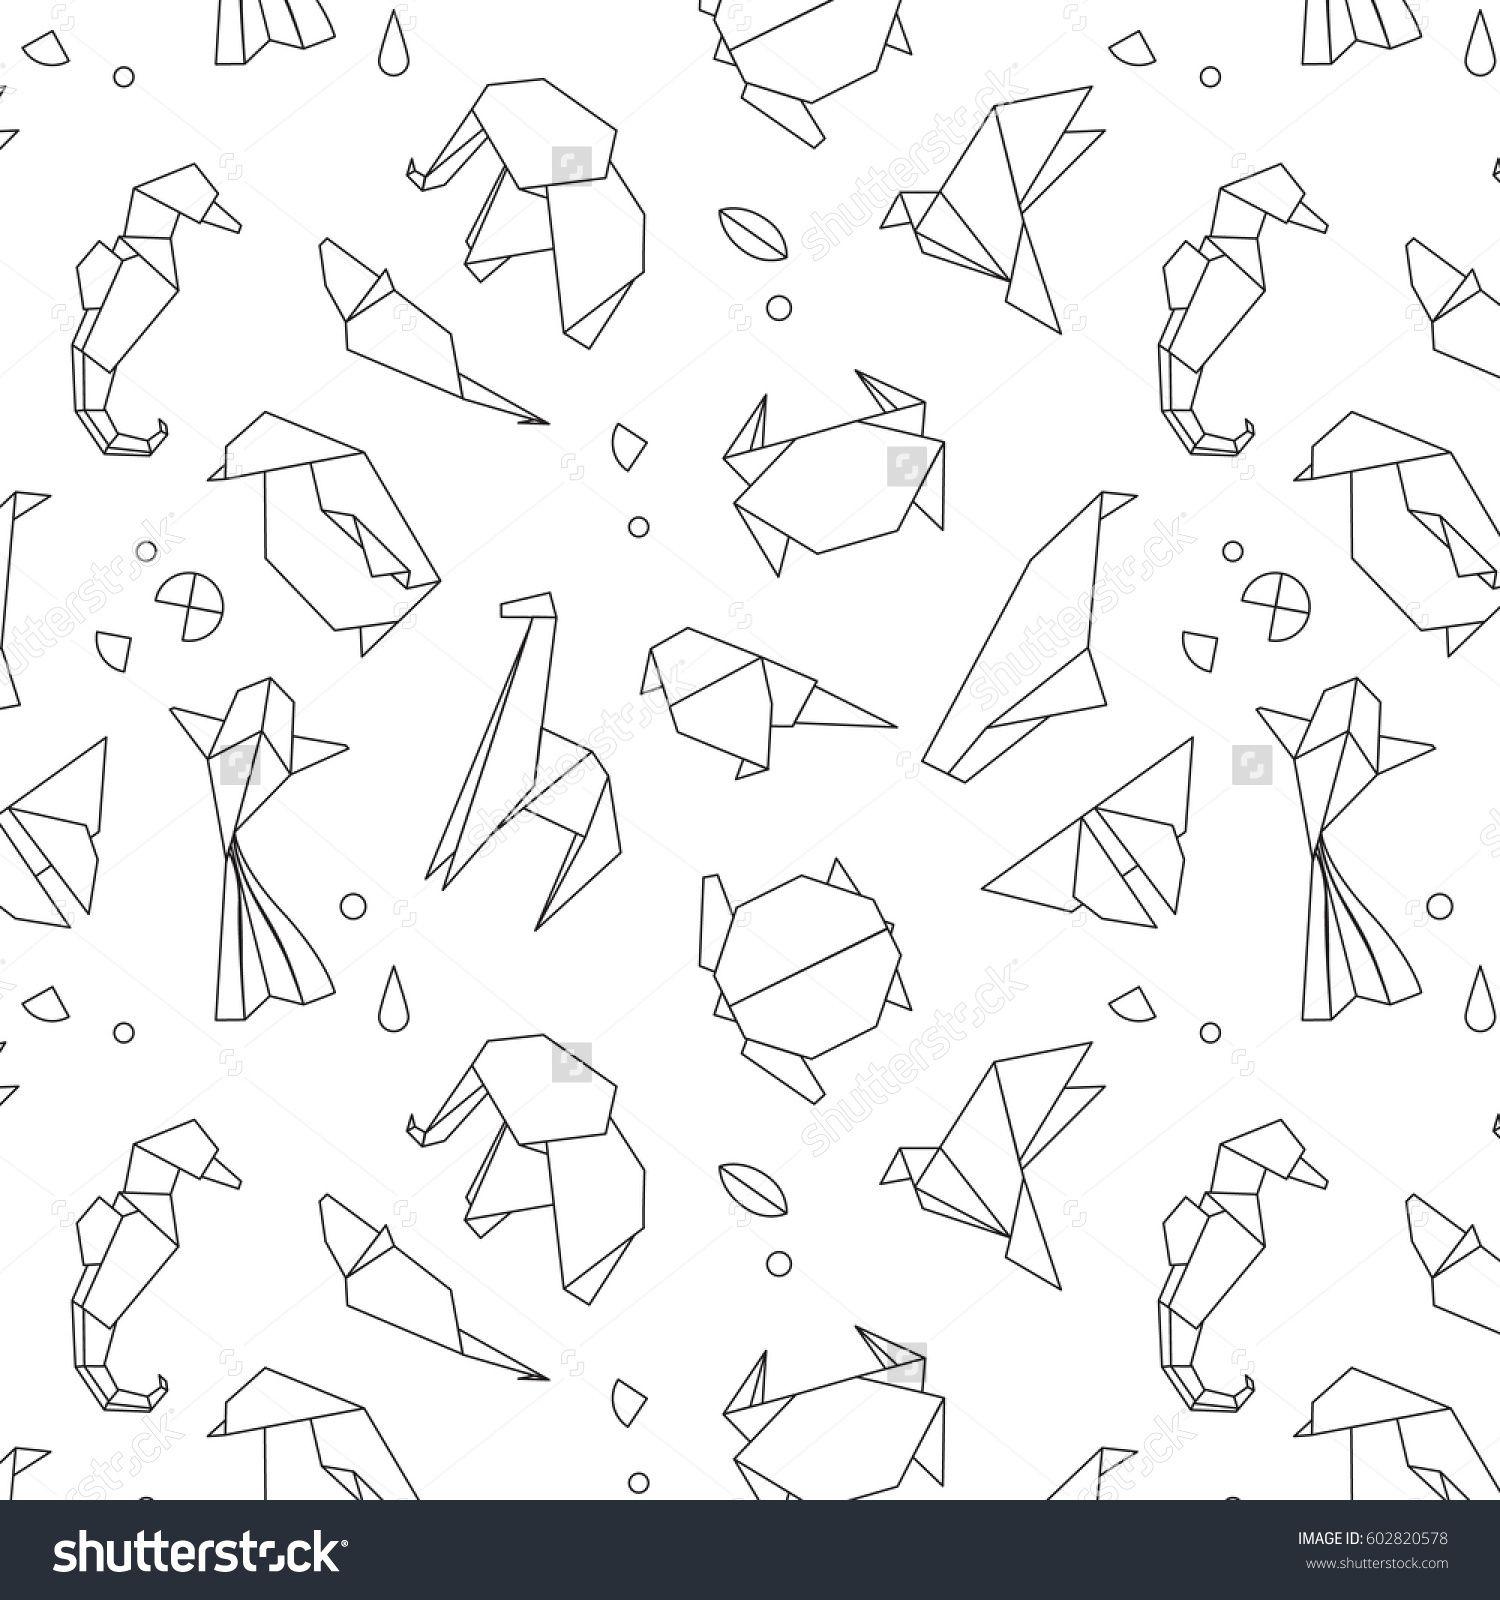 Photo of Animals Origami Pattern Snake Elephant Bird Stock Vector (Royalty Free) 602820578